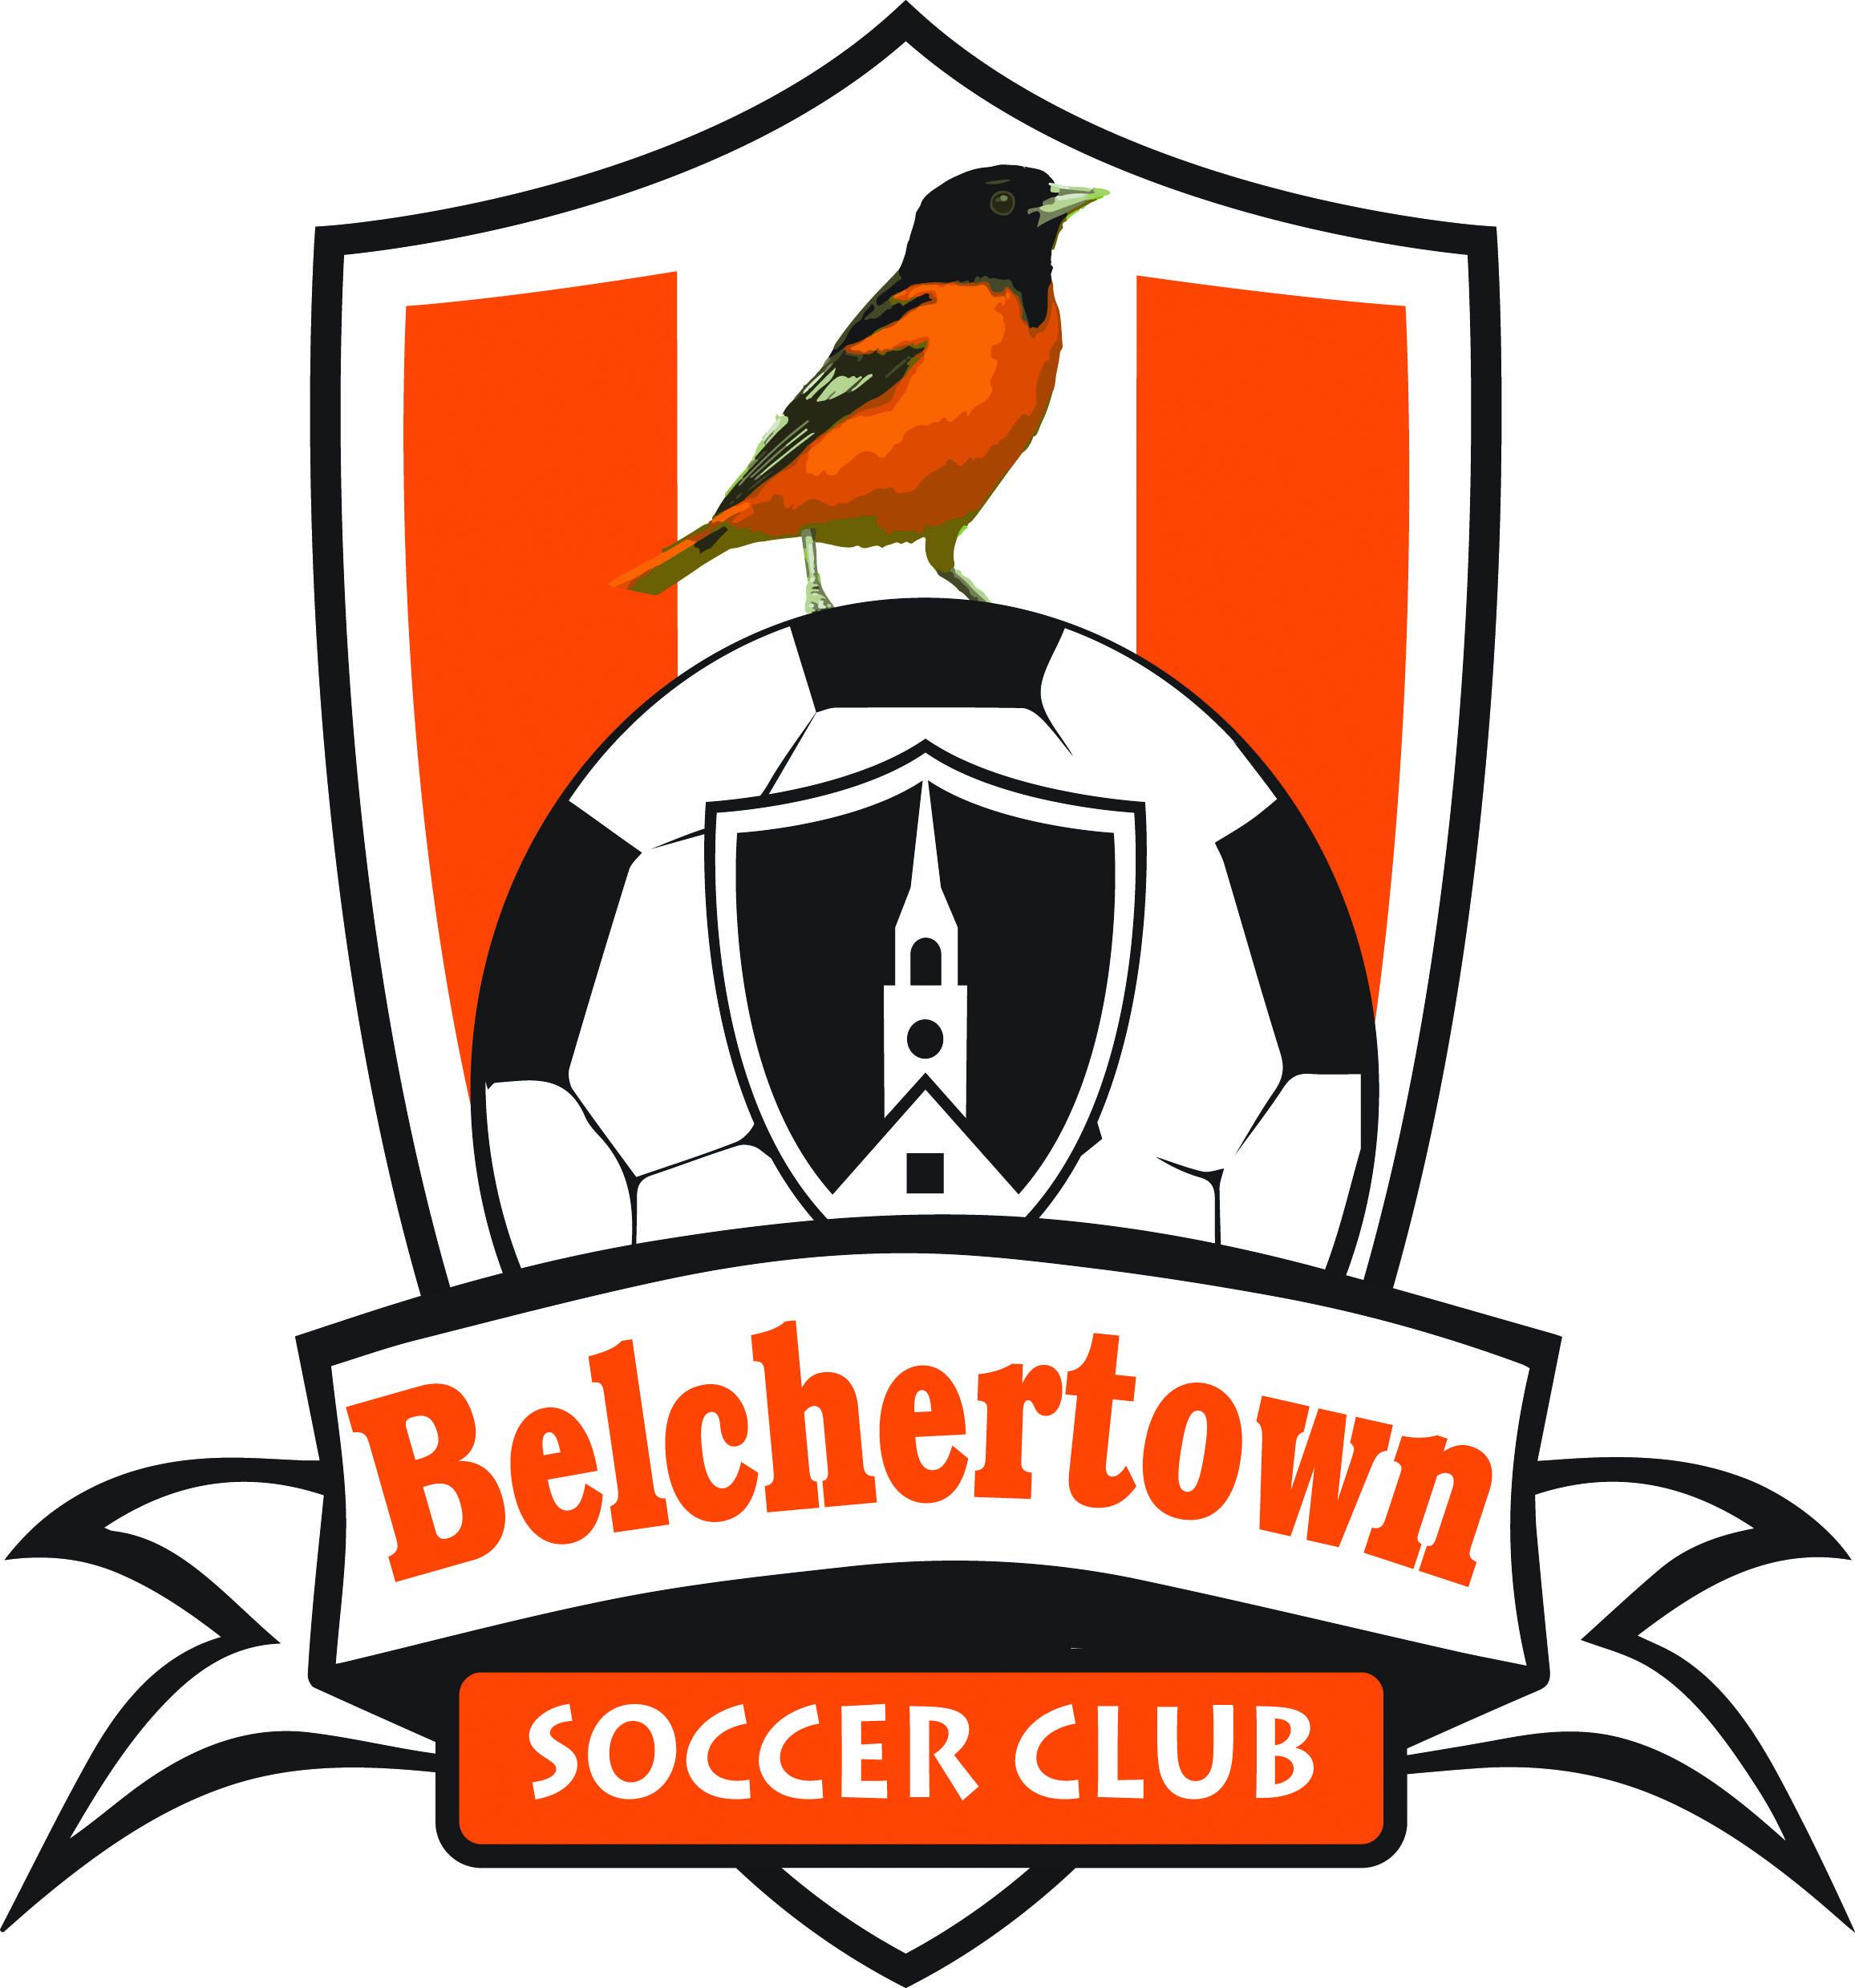 Belchertown Soccer Club